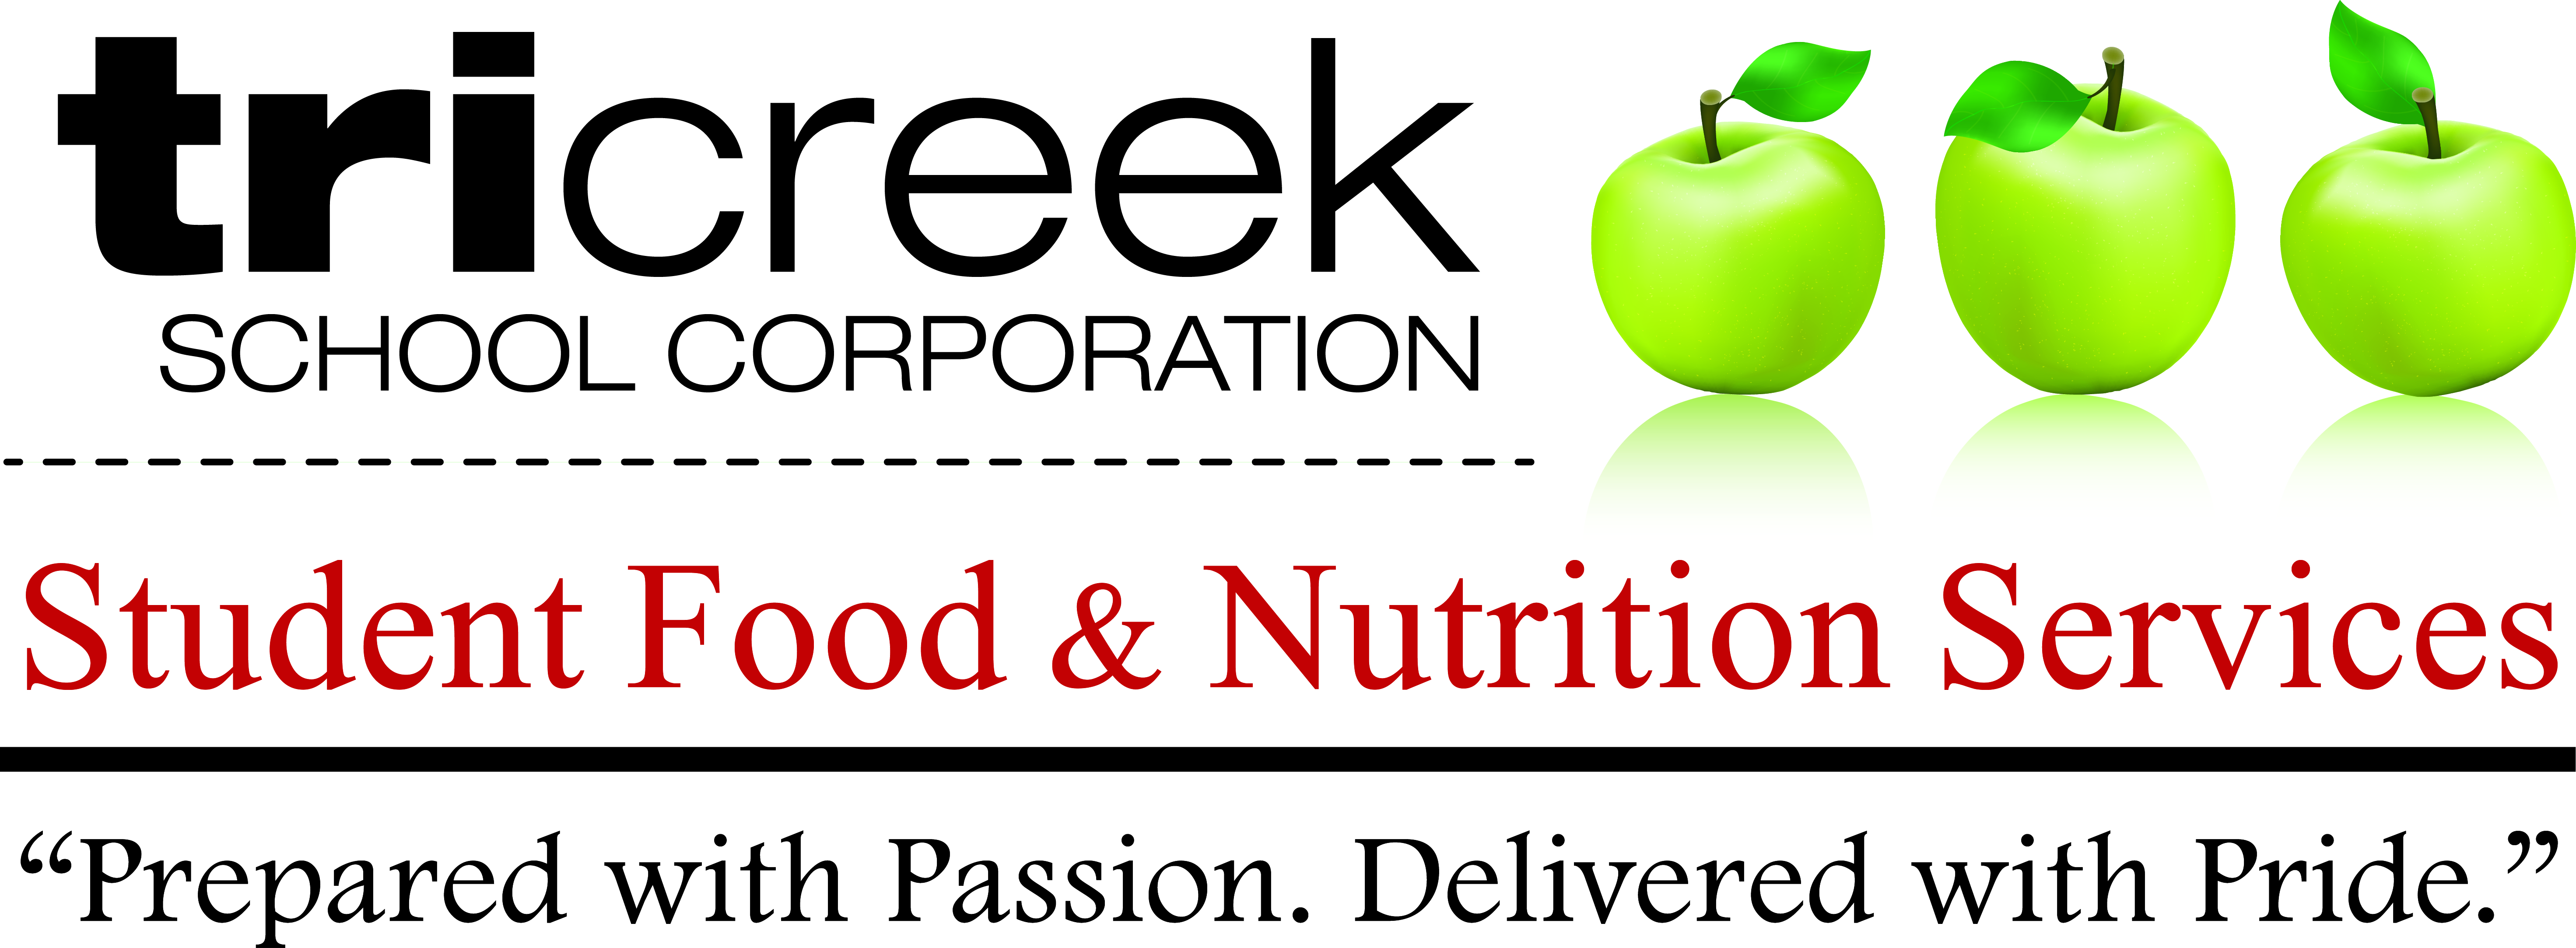 Nutrition_Services_Logo_Files_CMYK-PRINT-Hi_Res.jpg